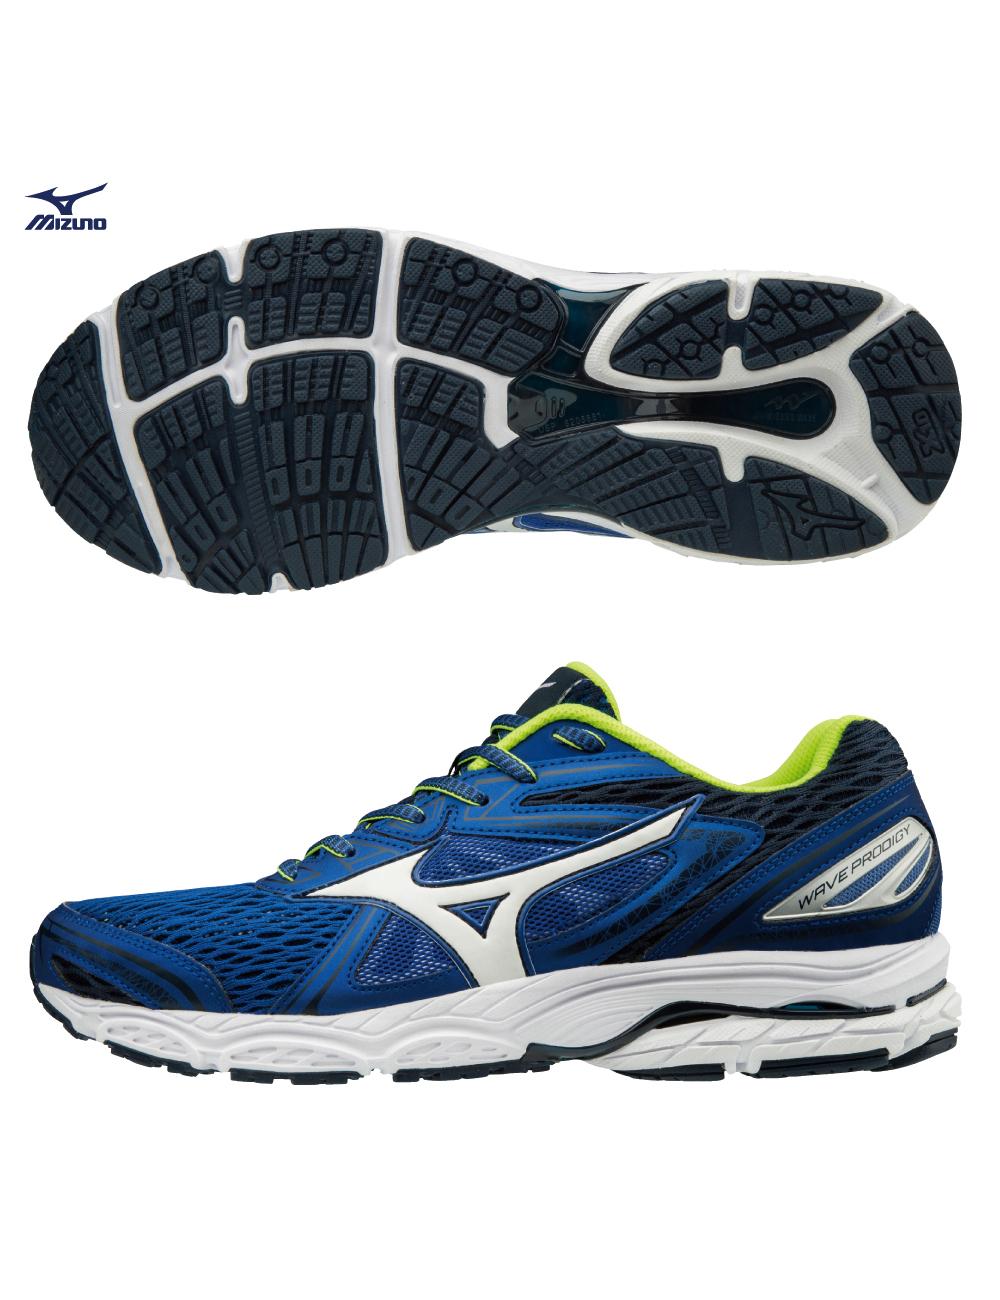 Mizuno Scarpe Corsa Running Shoes Sneakers Trainers Wave Prodigy 2018 Blu 7  7 di 7 Vedi Altro 2b2d19197bb